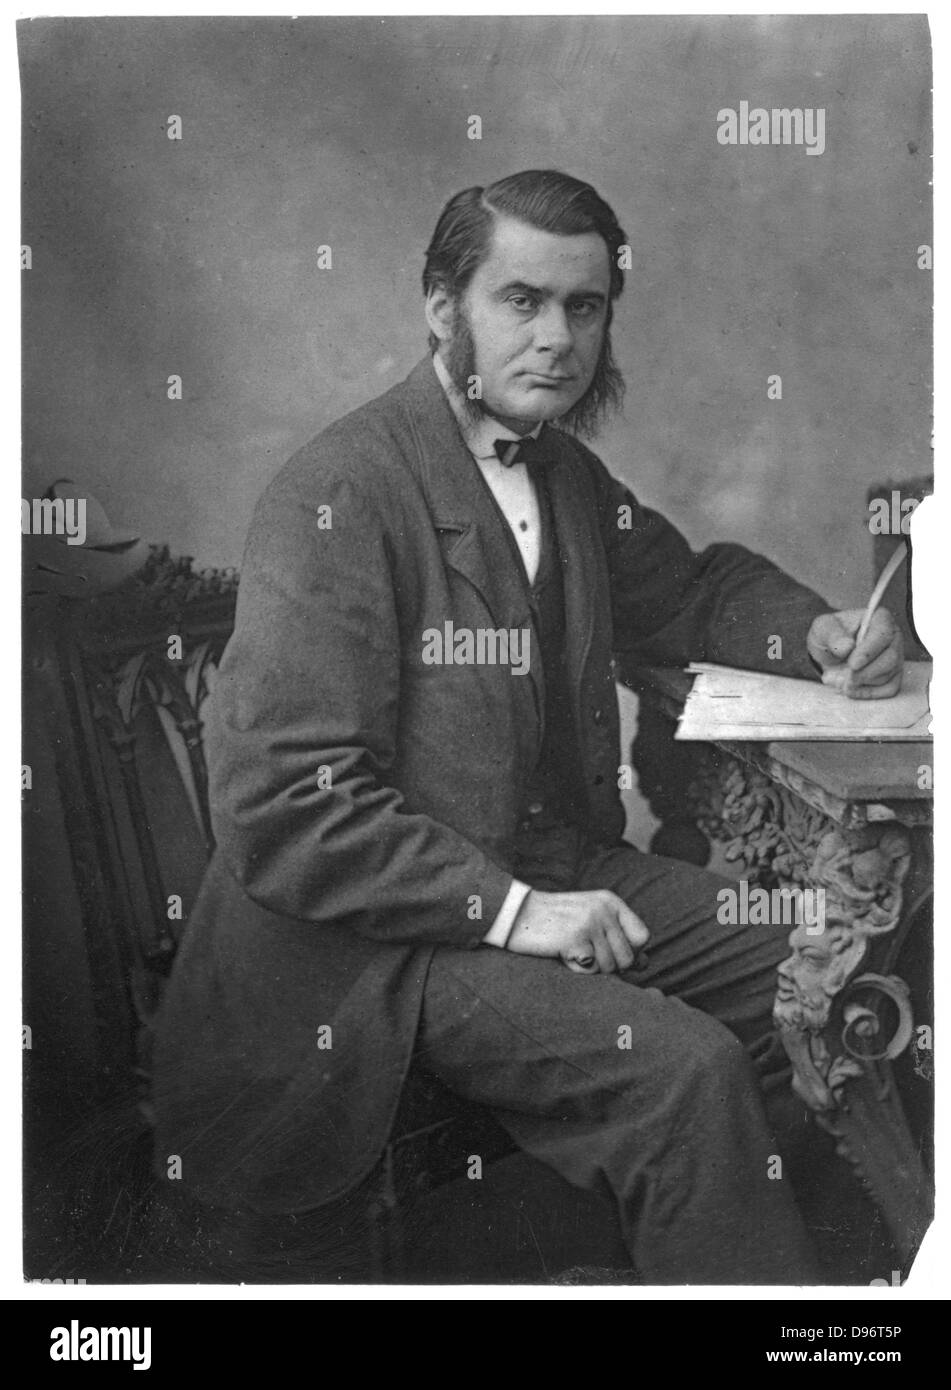 Aldous Huxley grandfather